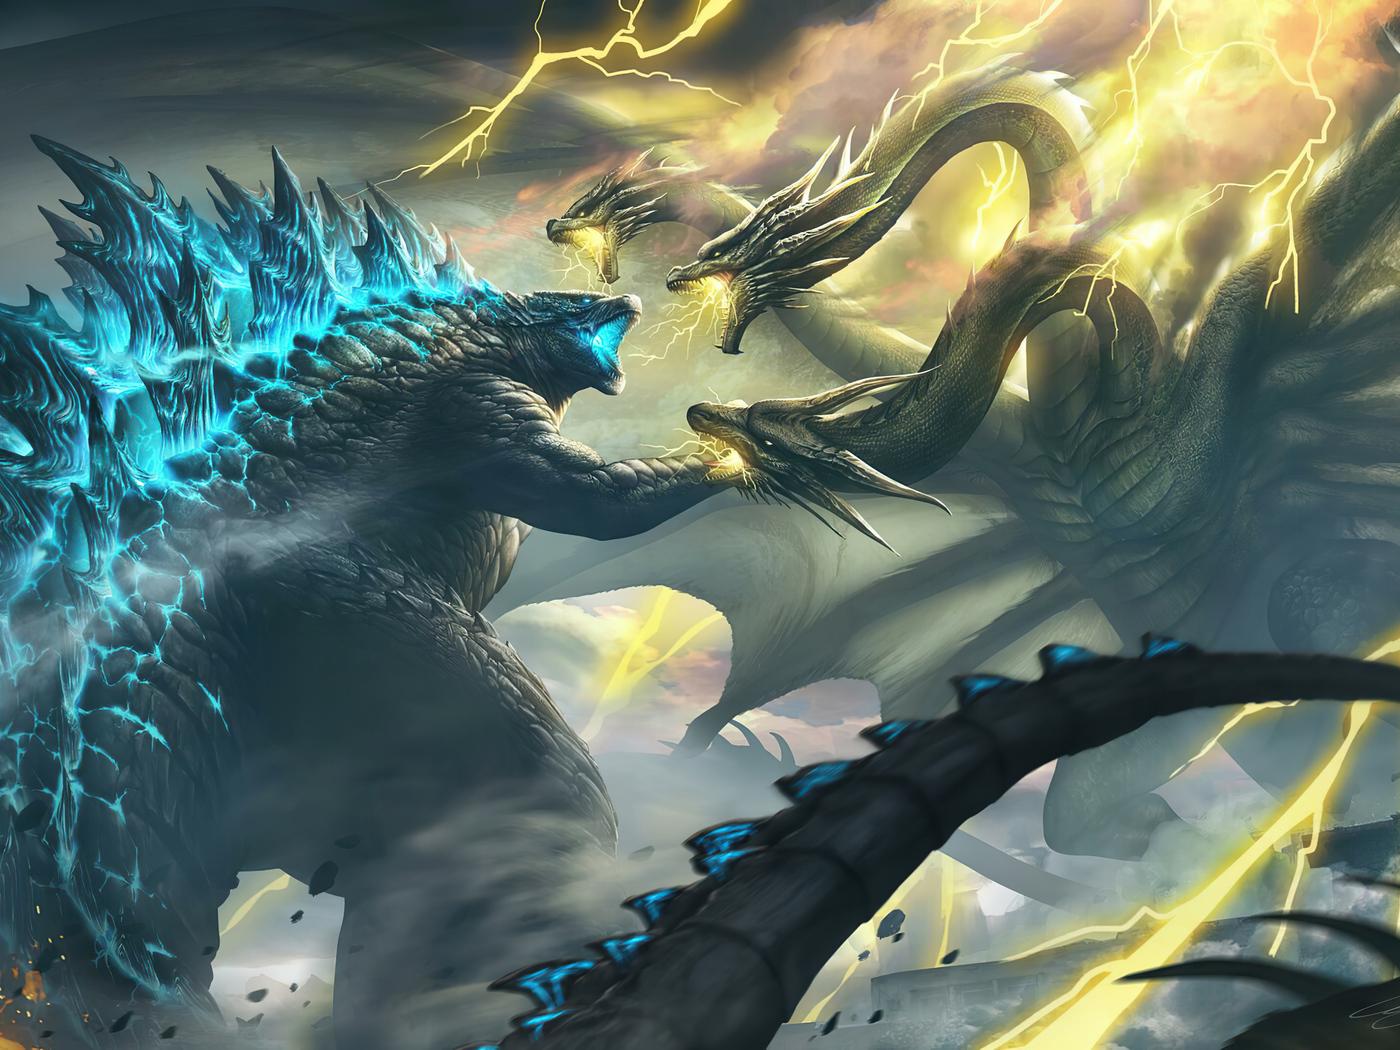 ghidorah-godzilla-king-of-the-monsters-4k-bu.jpg